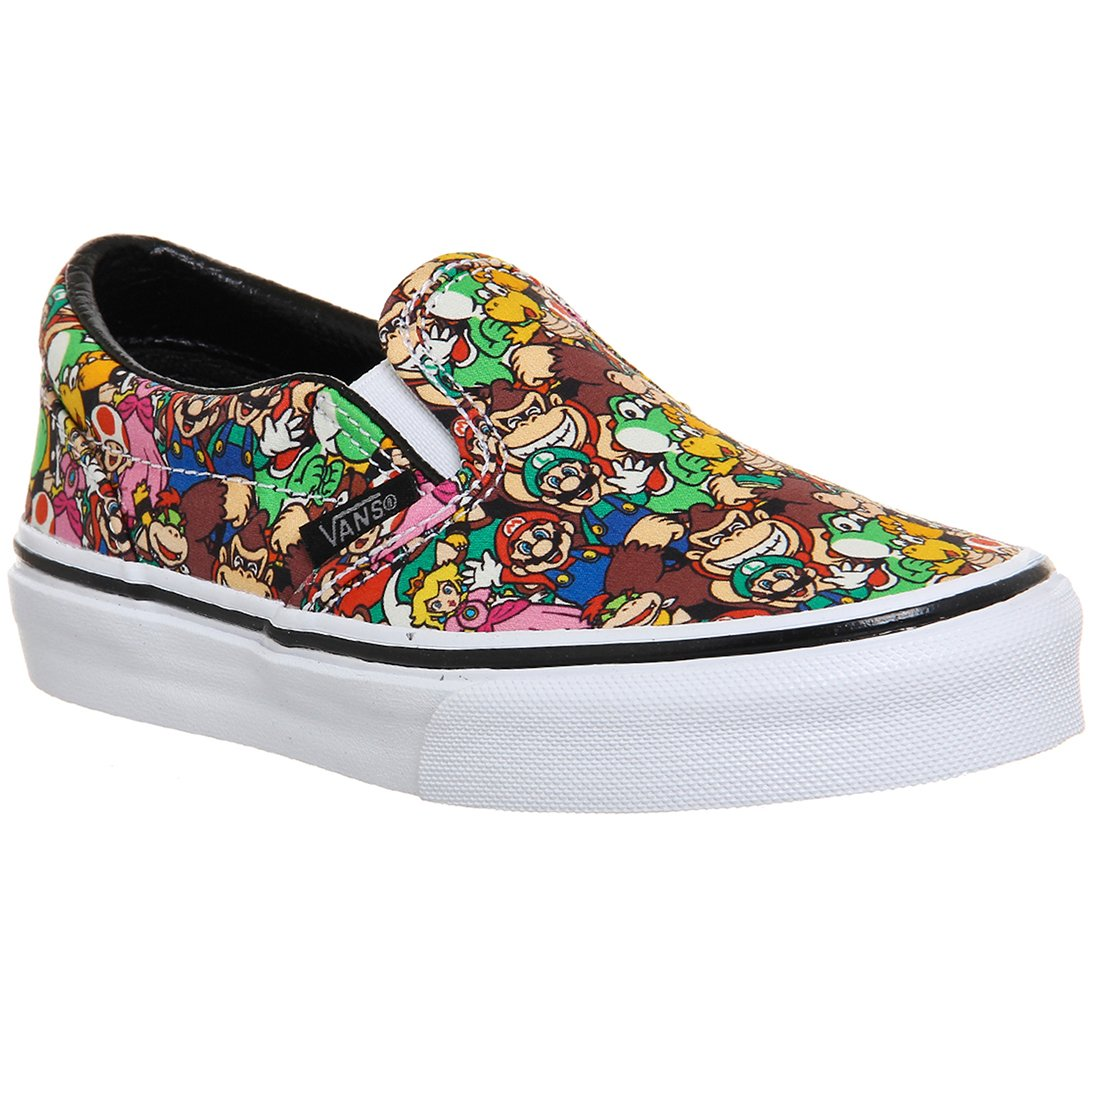 Vans Classic Slip-On Nintendo Super Mario Brothers Leather Skateboarding Shoe - 7.5M/6M